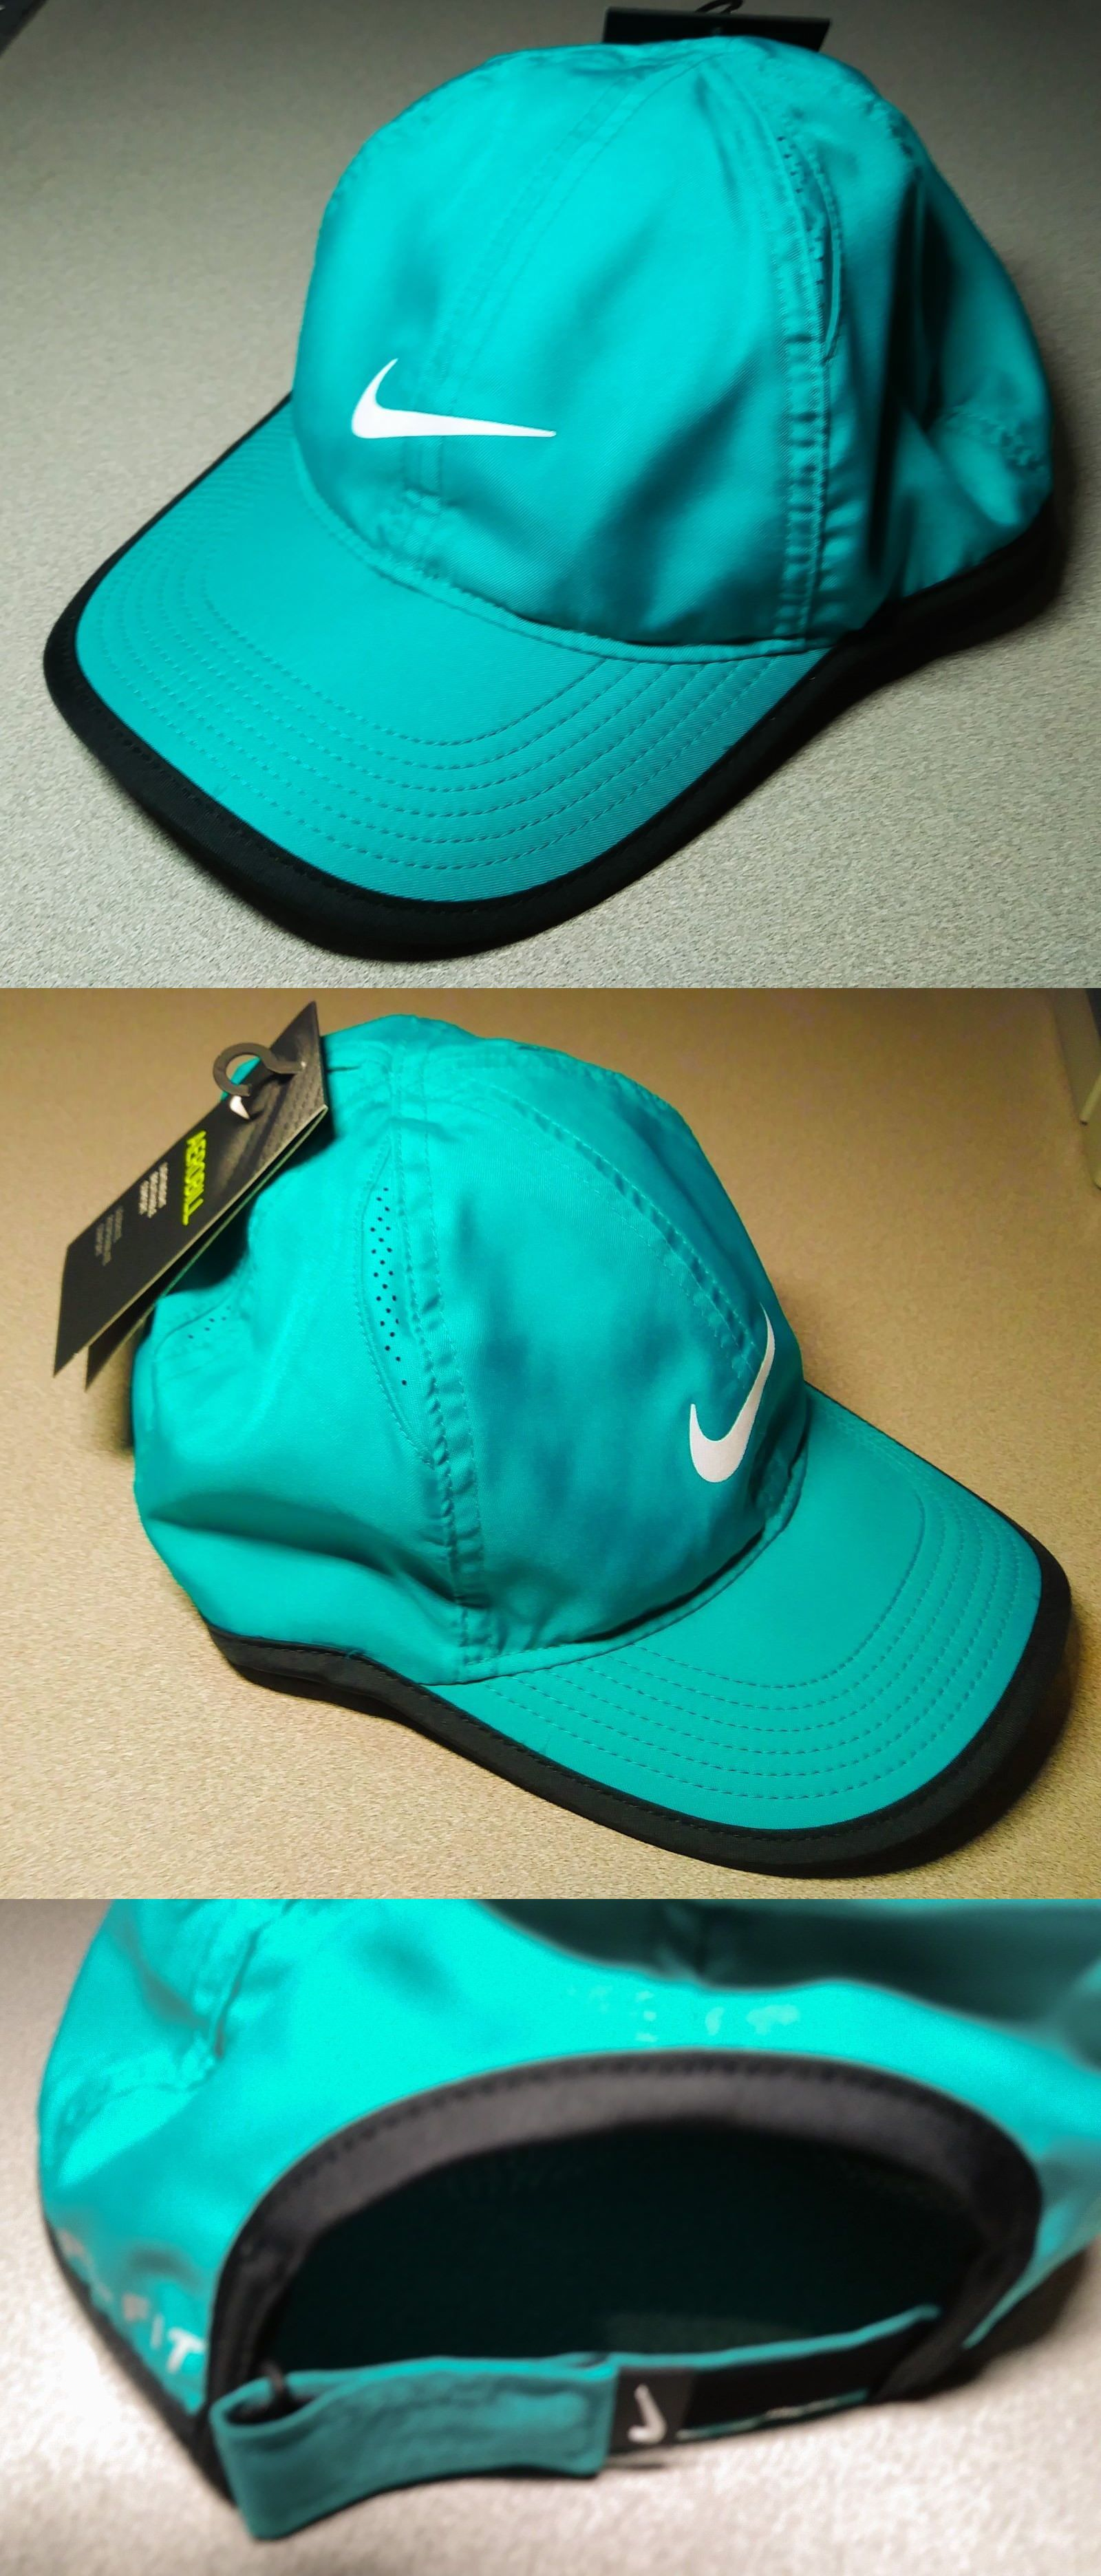 26c9e795edddd Hats 57884  Nike Featherlight Youth Cap Hat Teal Velcro Back Nwt 739376-311  Youth